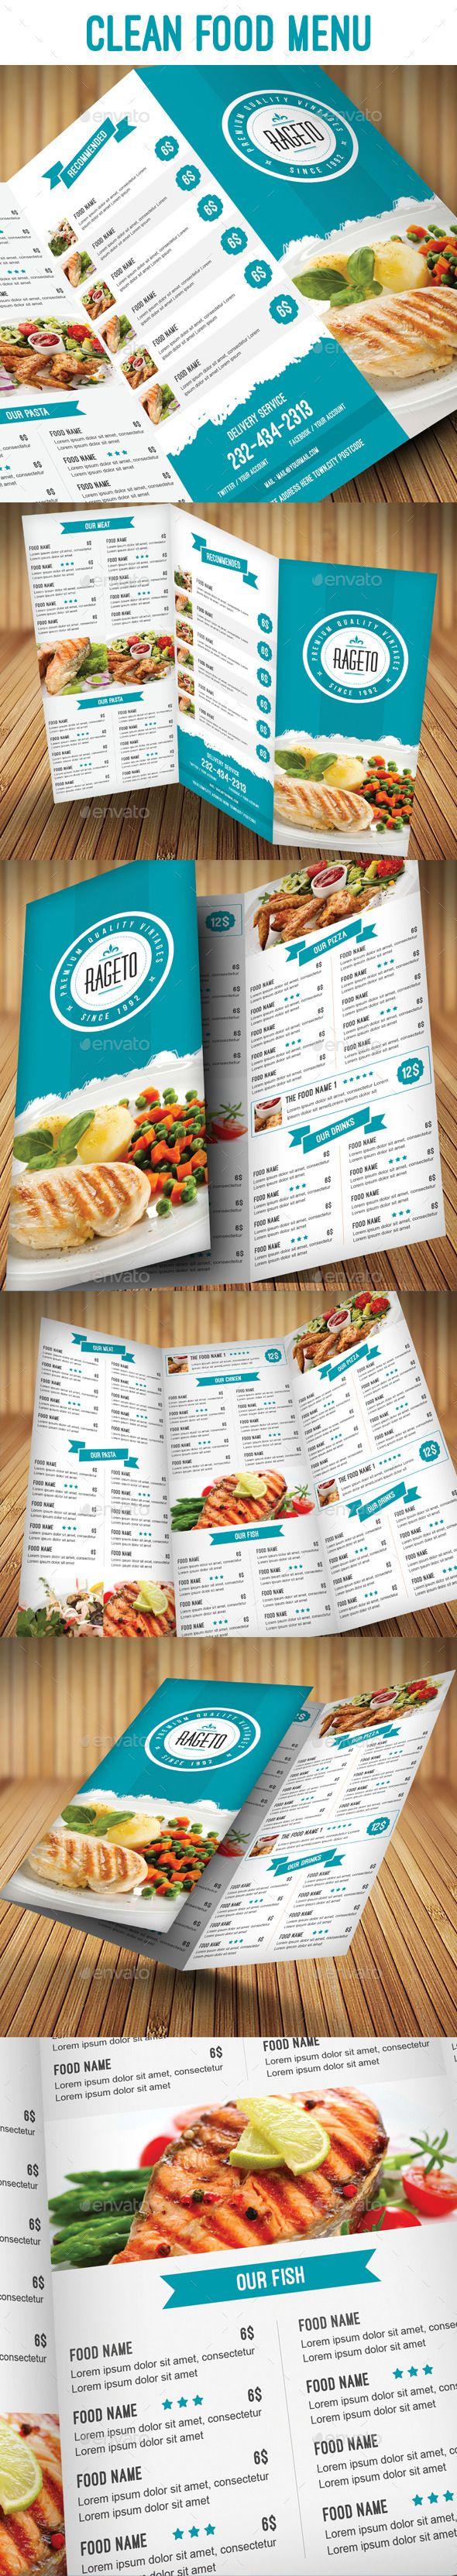 Clean Food Menu Template #design Download: http://graphicriver.net/item/clean-food-menu/9477199?ref=ksioks